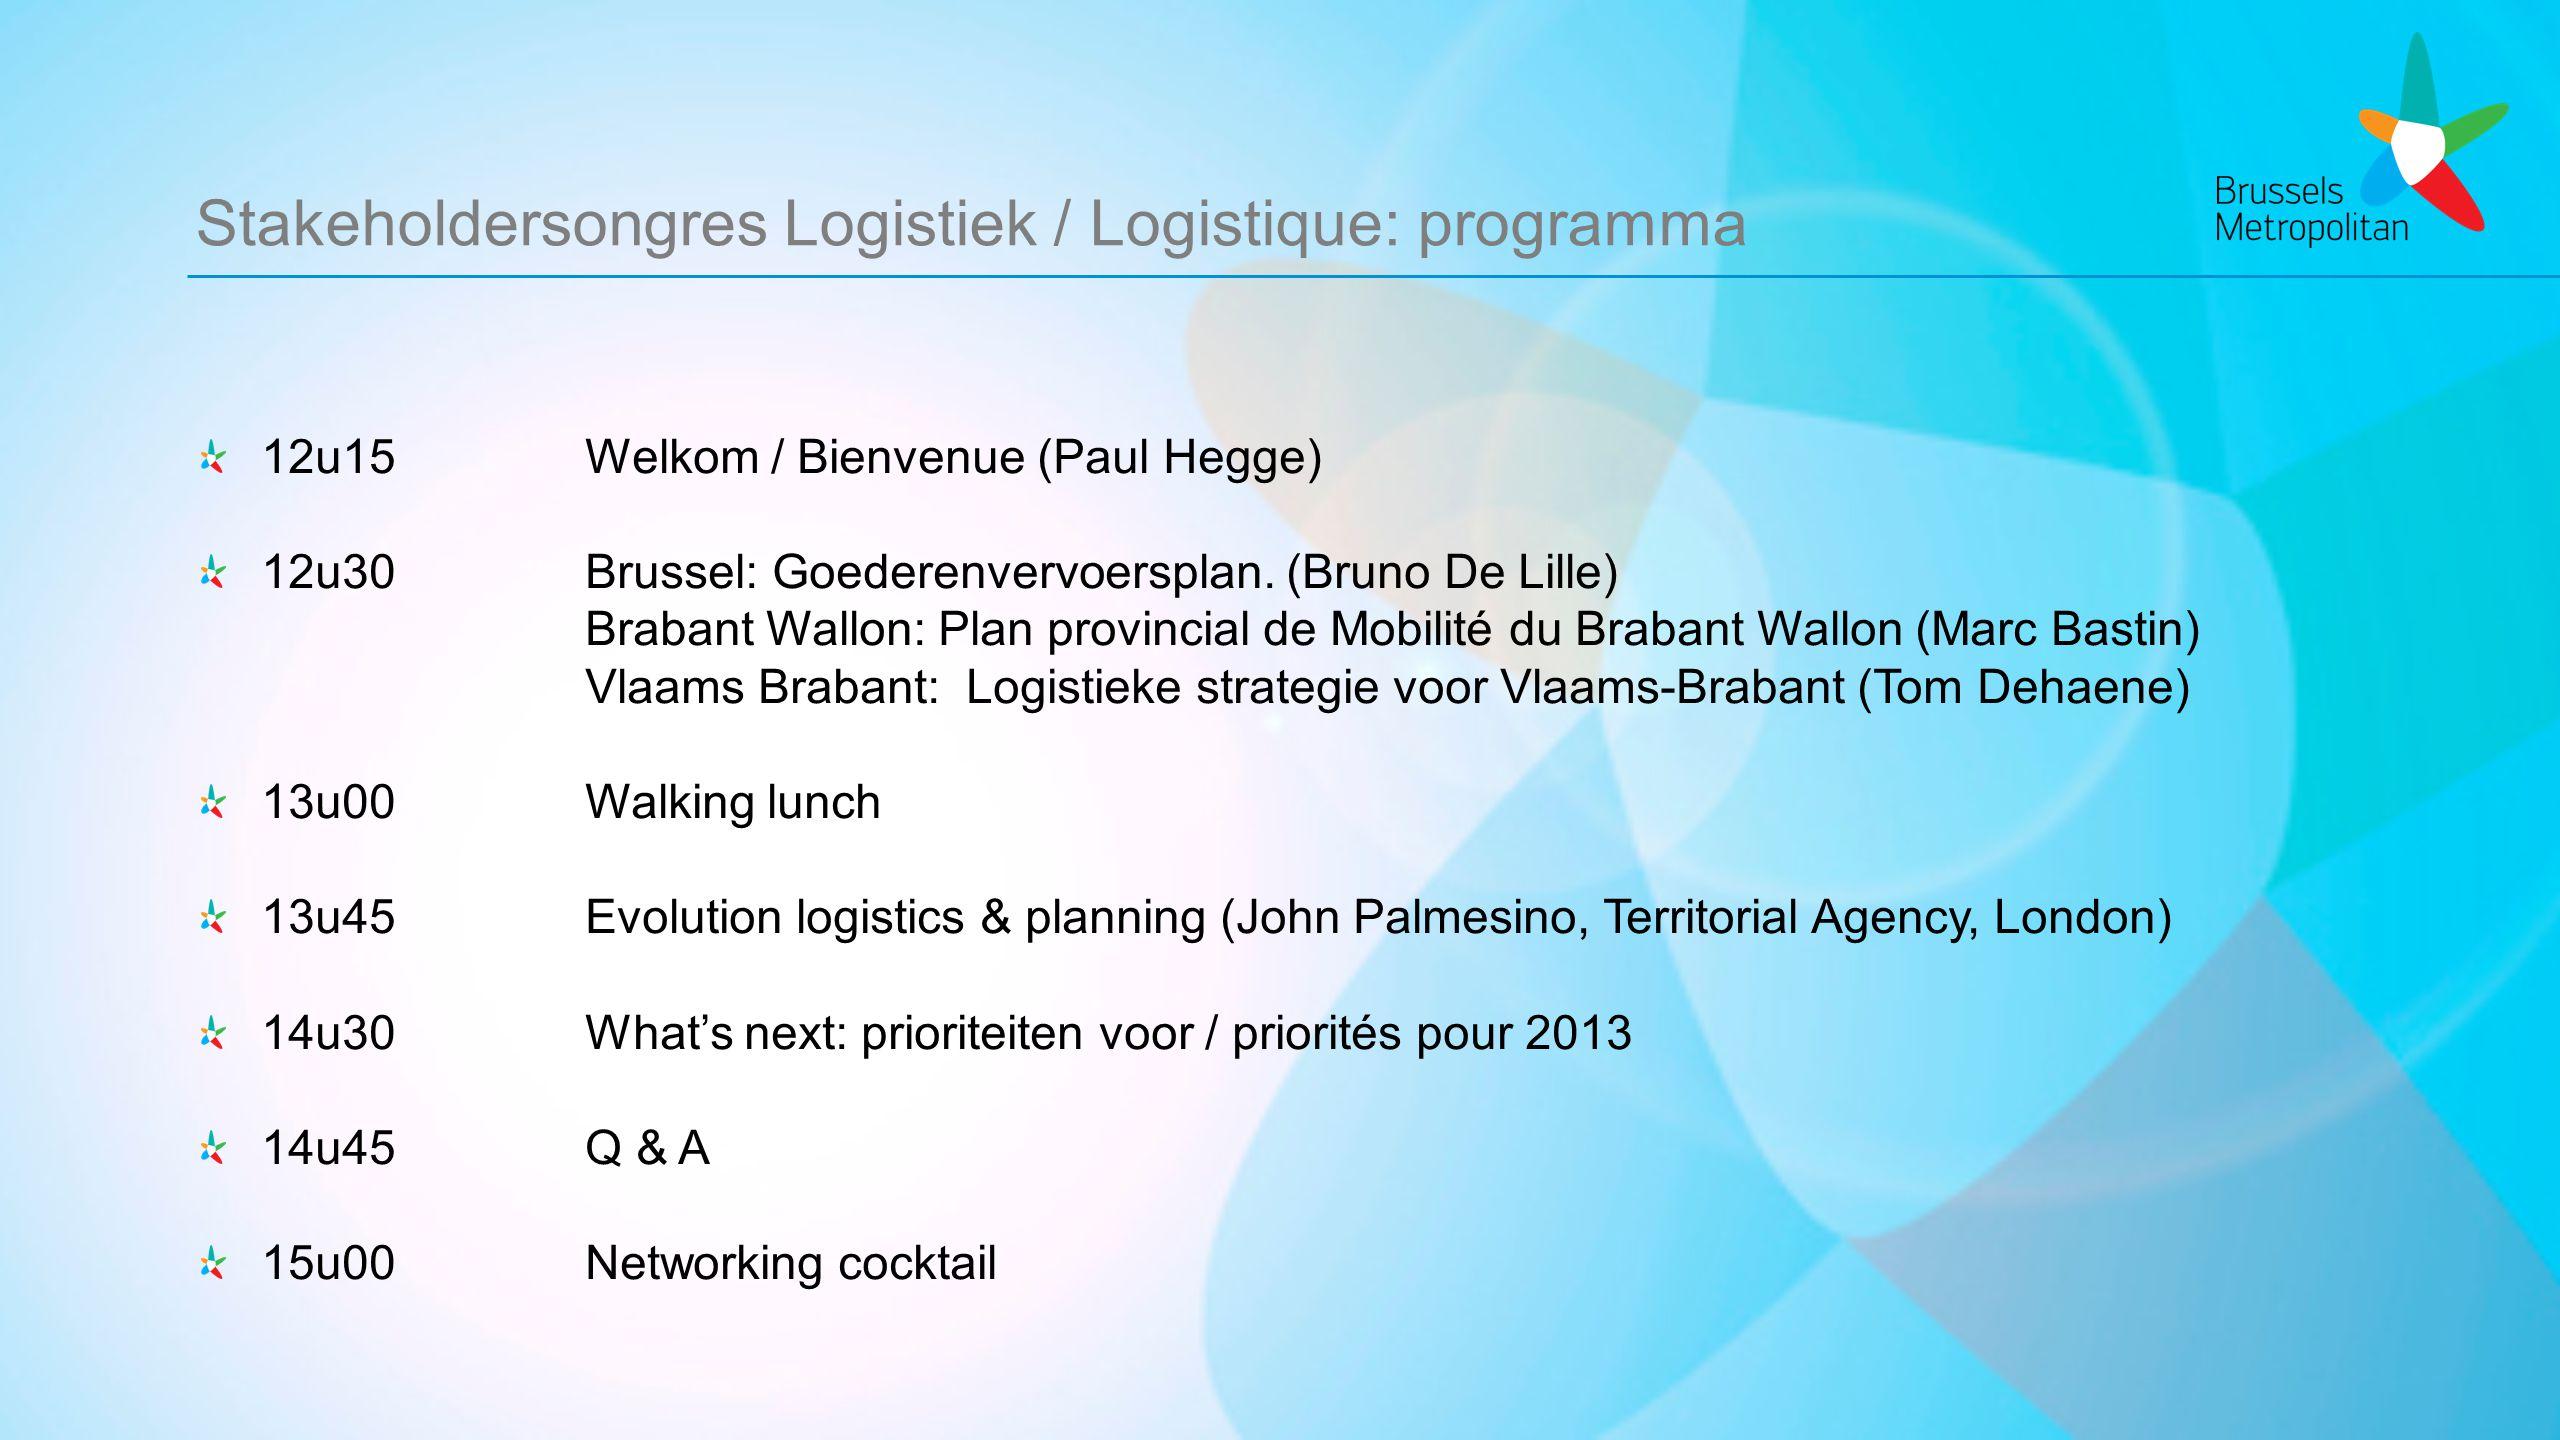 Stakeholdersongres Logistiek / Logistique: programma 12u15Welkom / Bienvenue (Paul Hegge) 12u30Brussel: Goederenvervoersplan.